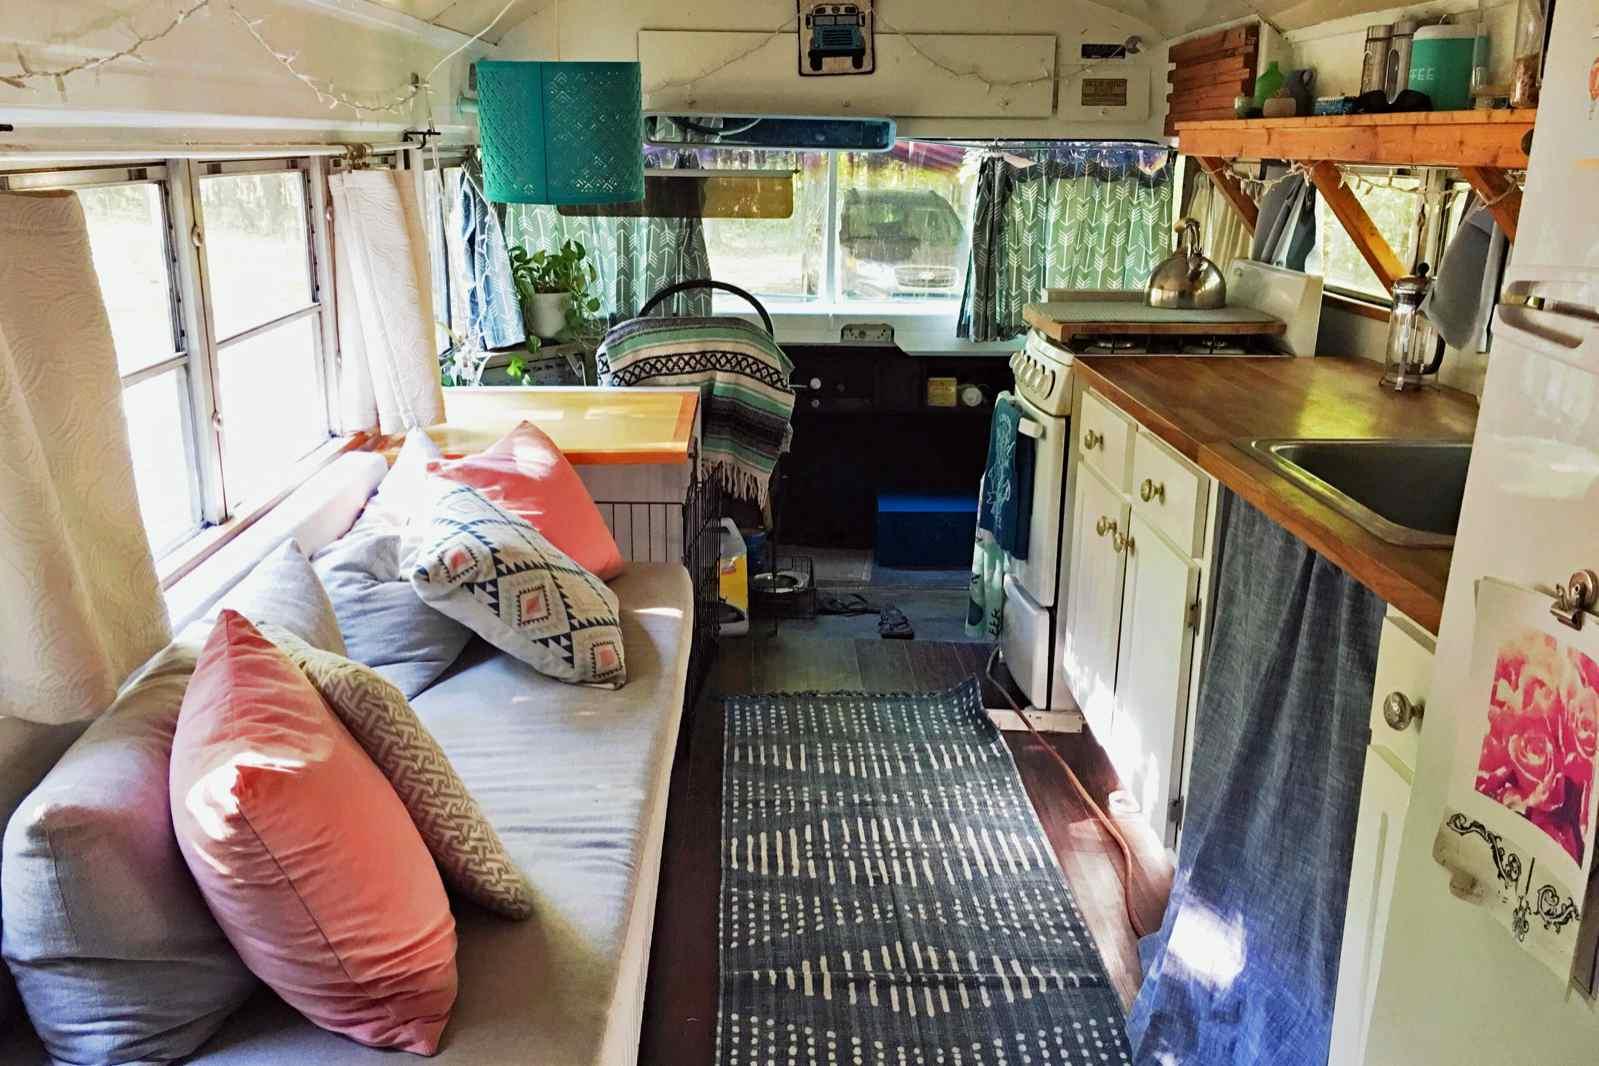 House bus kitchen